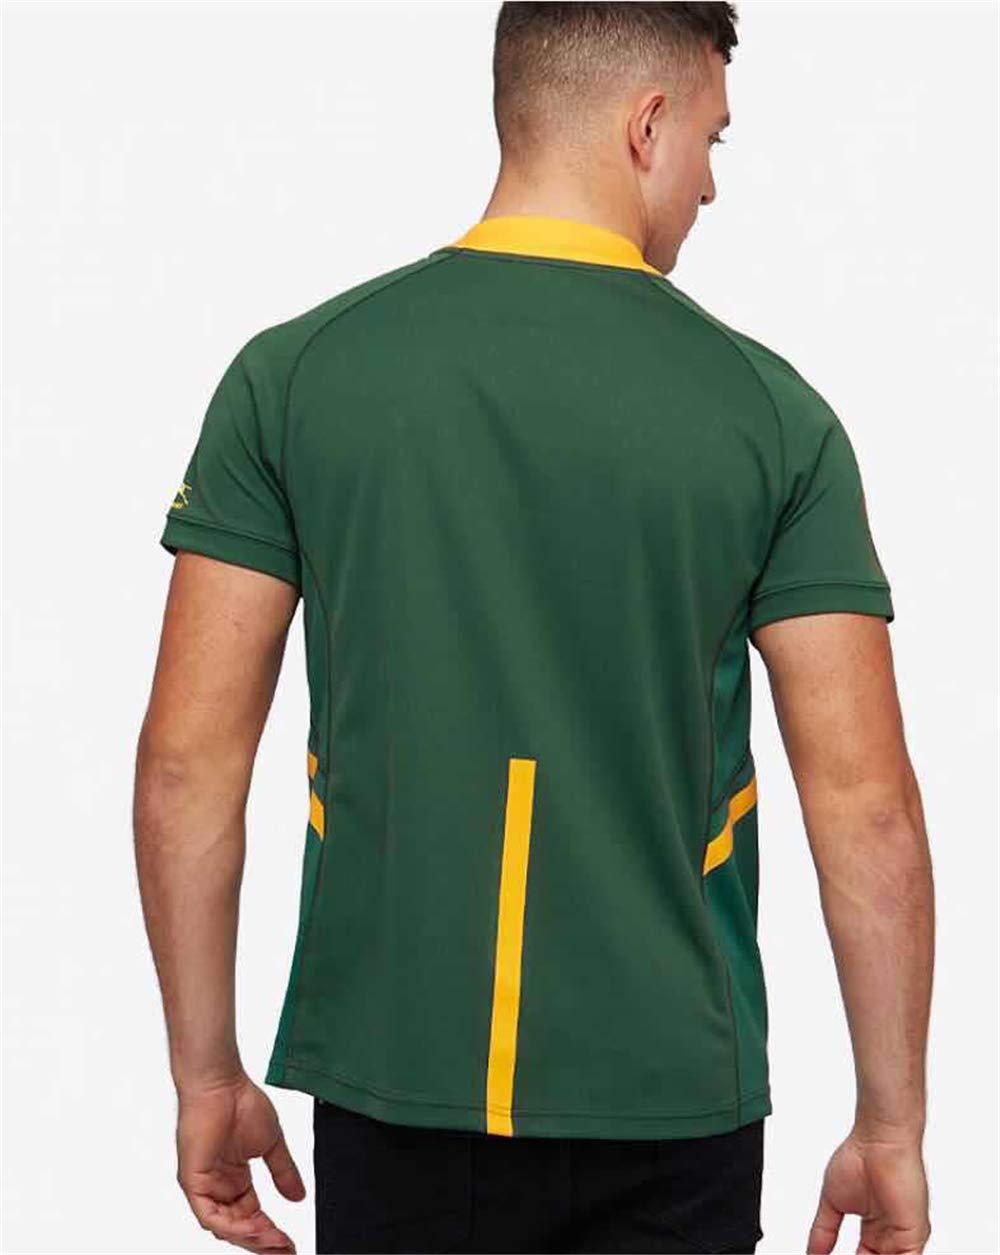 HBRE Rugby Jersey,2019 Cotton Jersey T-Shirt,Camiseta De Rugby Sud/áFrica,Camiseta De F/úTbol Local,Manga Corta Deportiva De Secado R/áPido,Ropa Deportiva De F/úTbol S-3xl